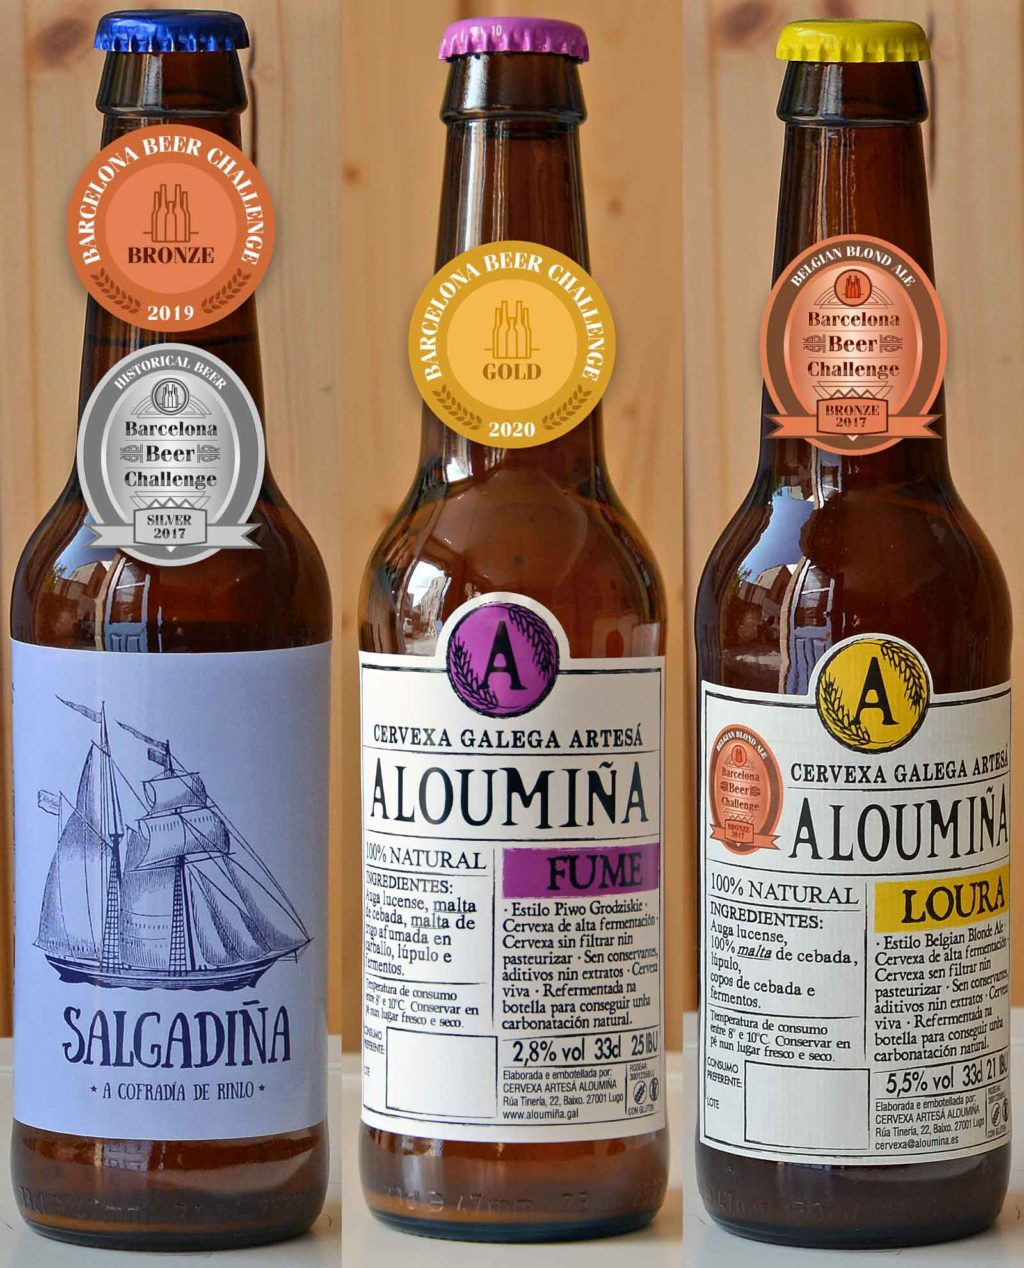 aloumina-cervexa-artesana-craft-beer-caja-variada-medallas-bbf-bbc-barcelonabeerchallenge